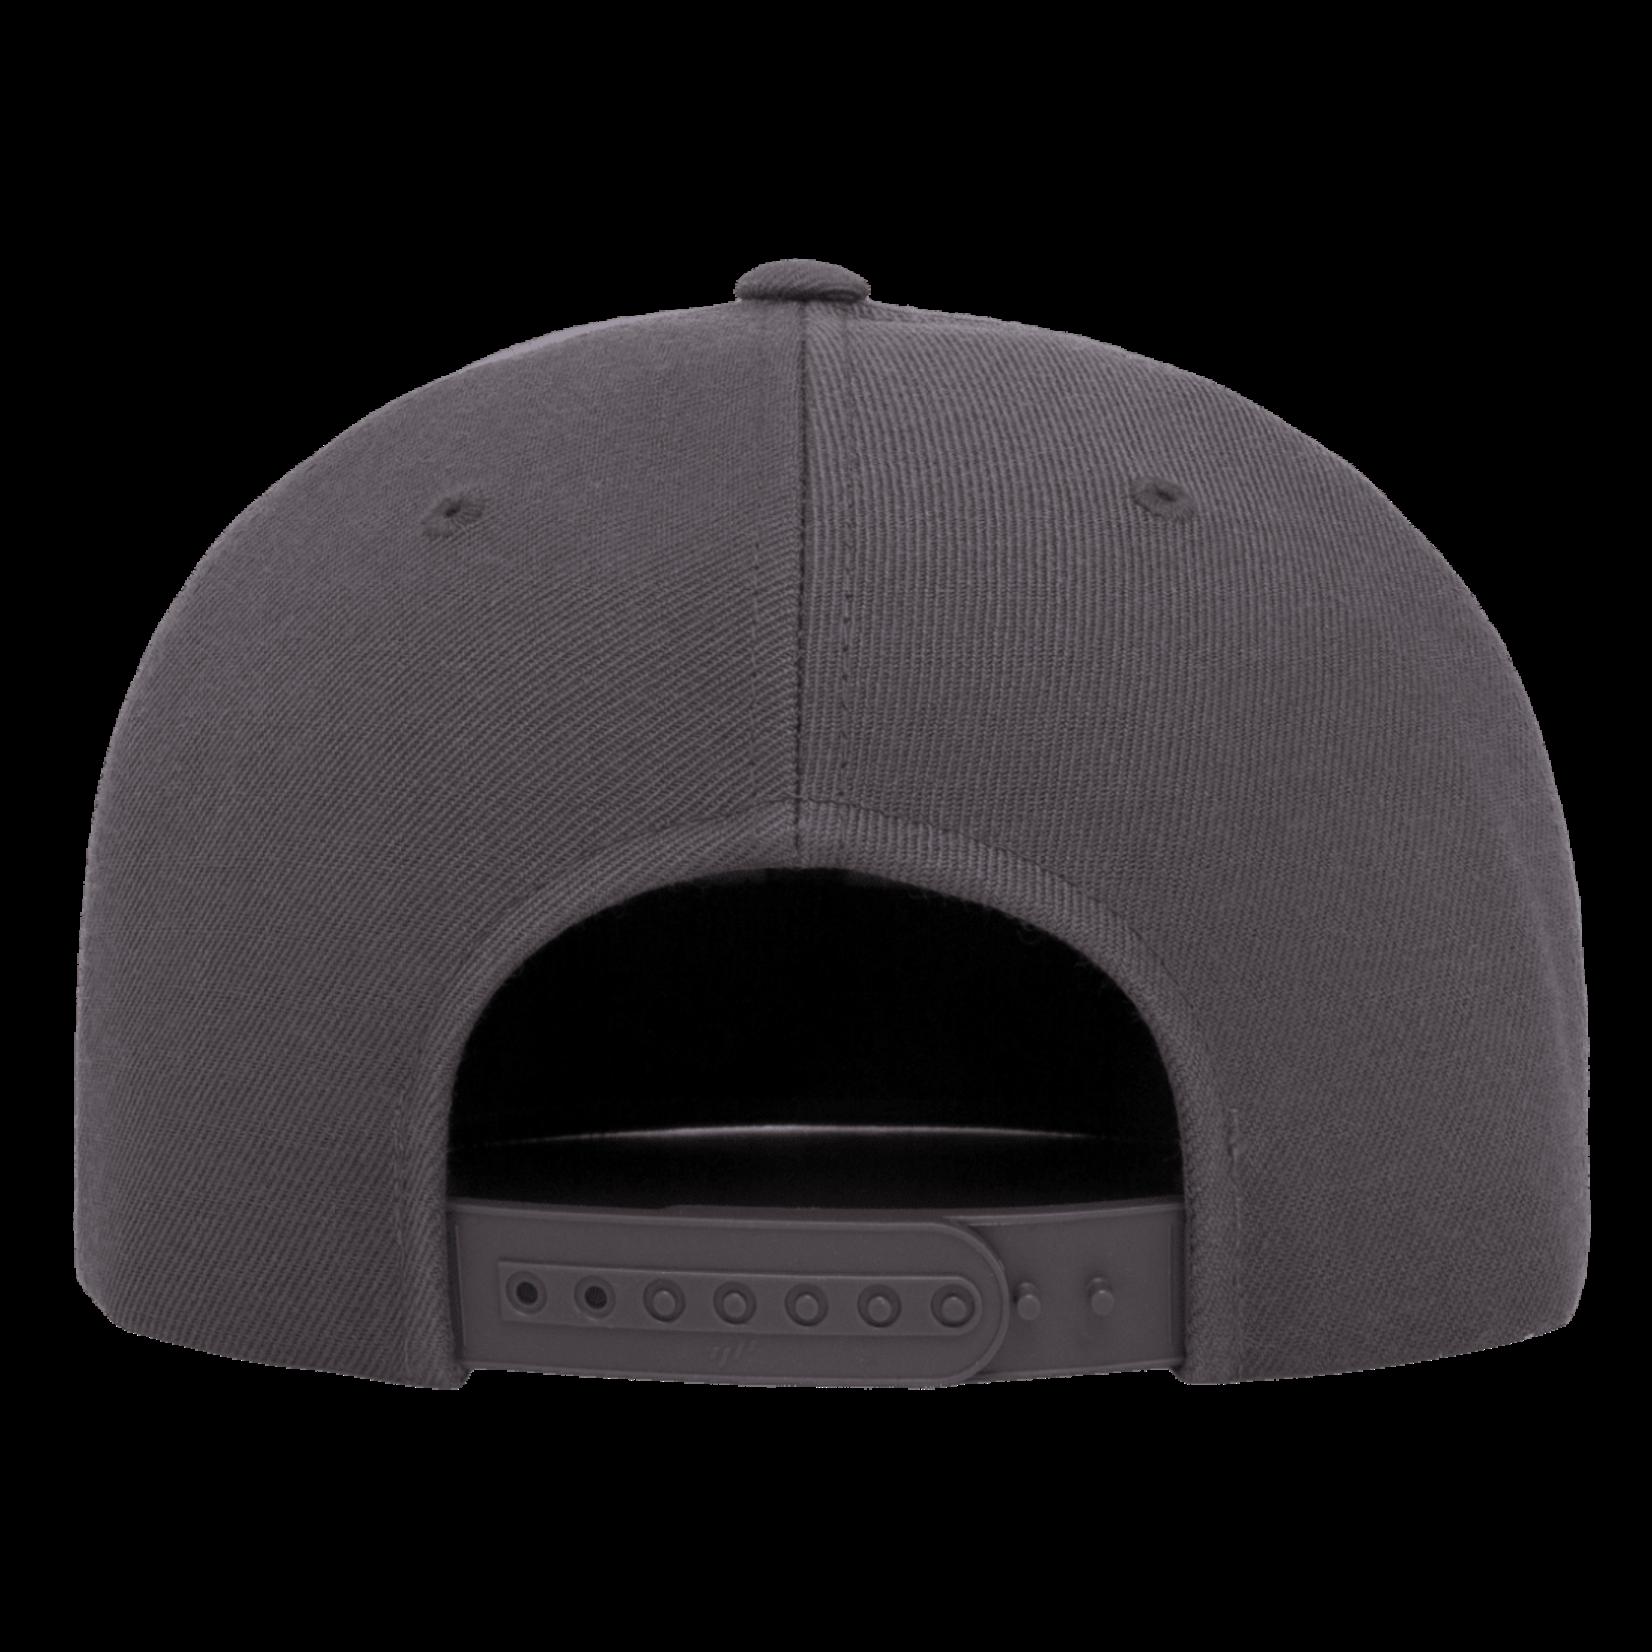 Flexfit Flexfit 6089M Premium Snapback Hat - Dark Grey